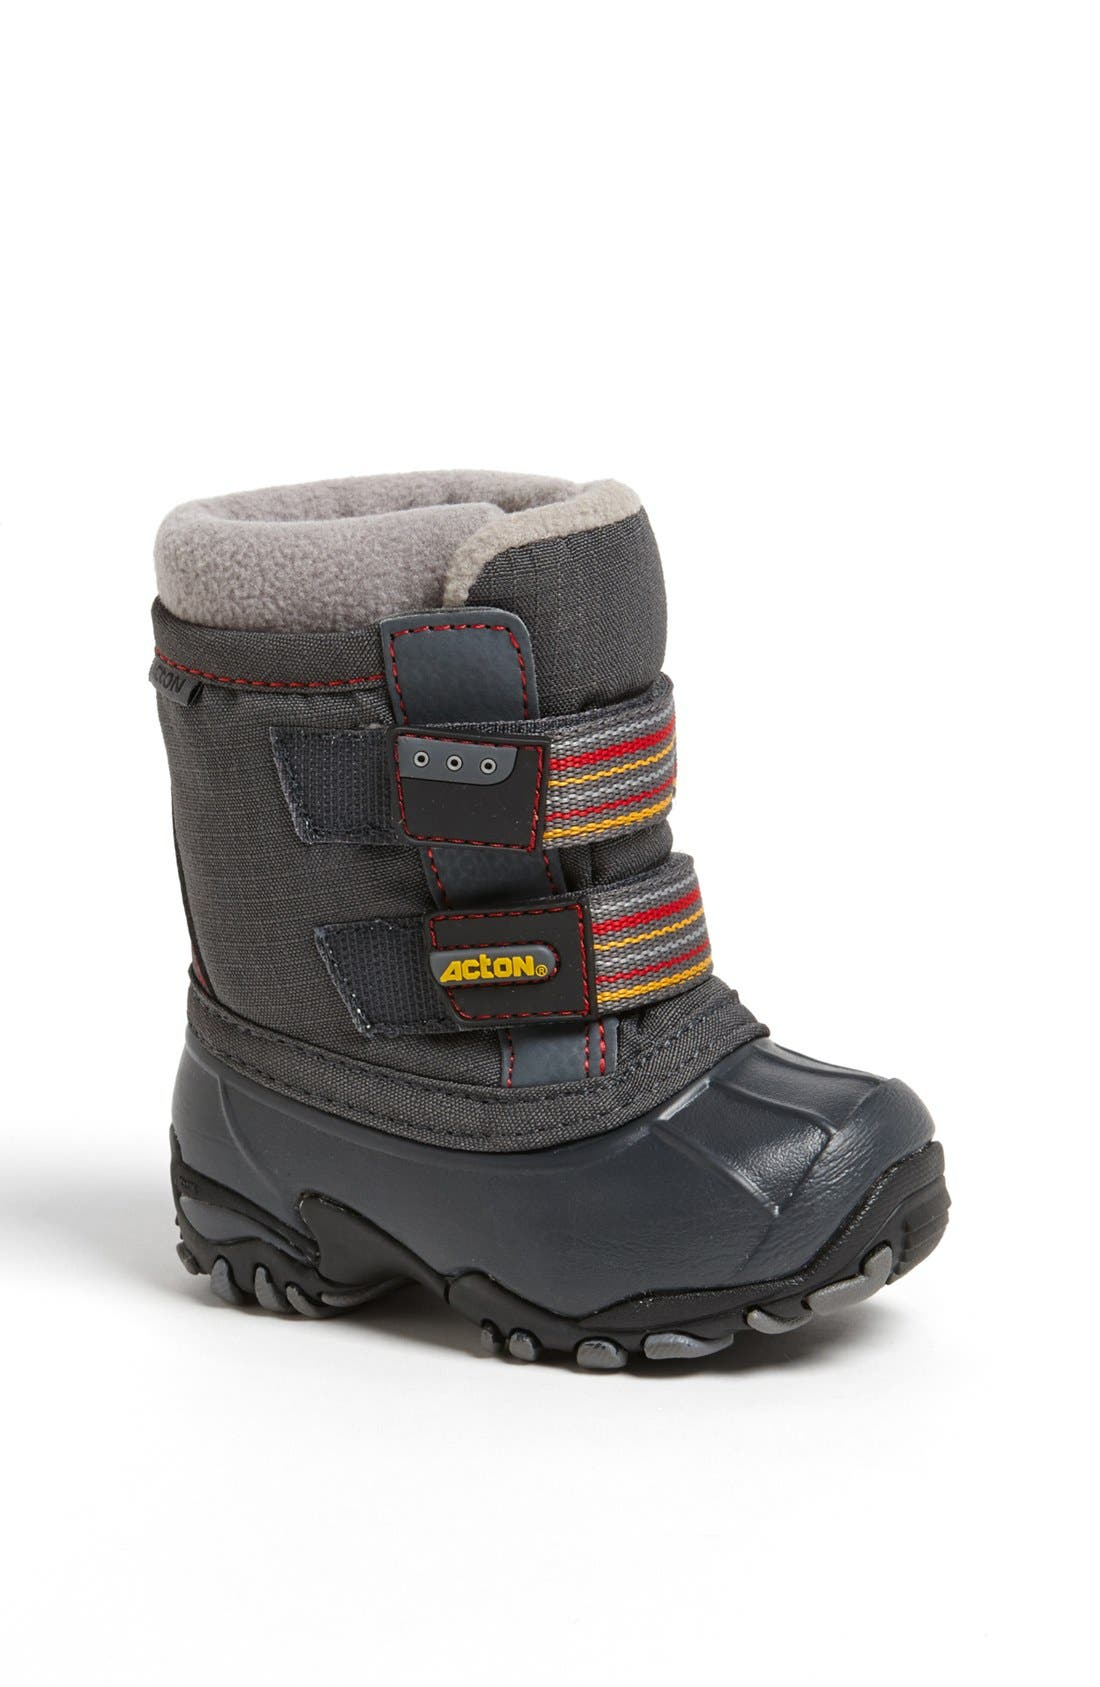 Main Image - Acton 'Lullaby' Waterproof Winter Boot (Walker & Toddler)